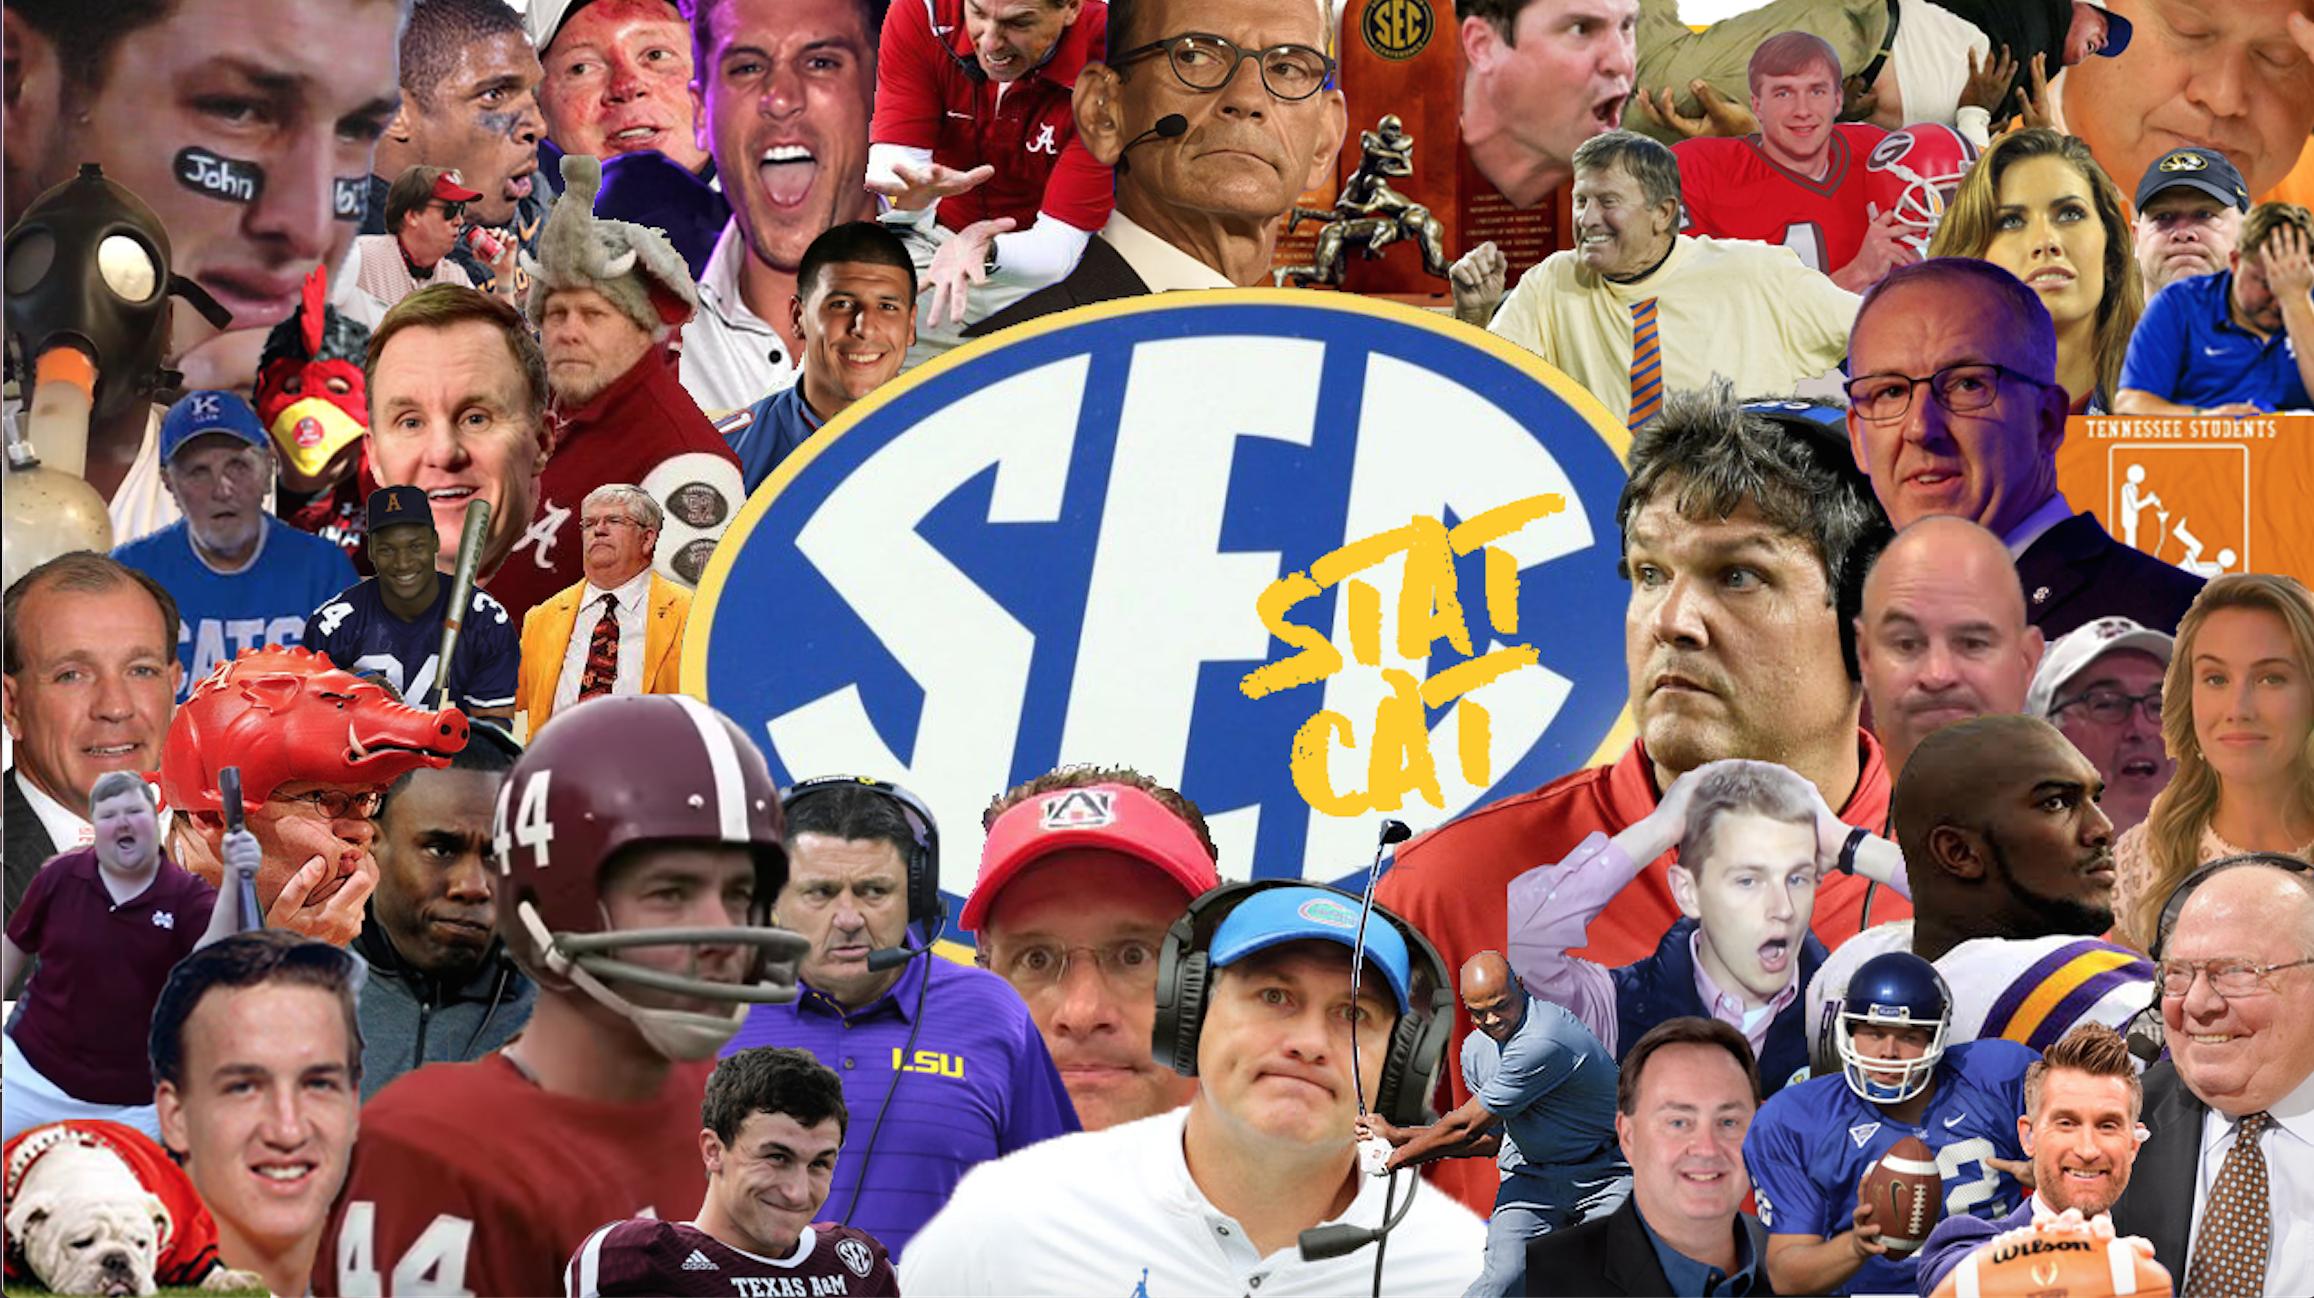 2019 SEC Statcast: Auburn Under/Over